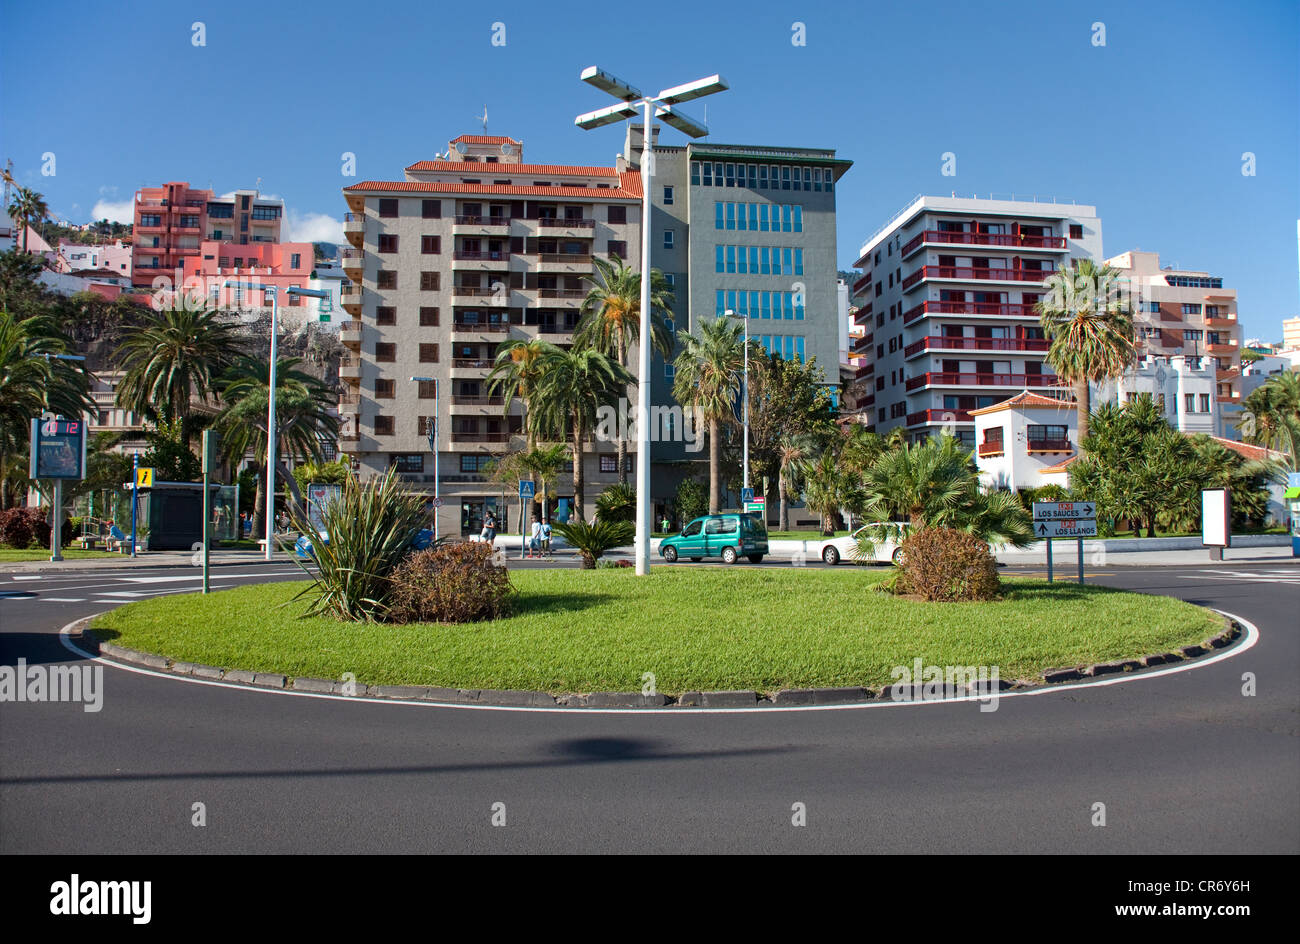 Plaza de la Constitucion, traffic roundabout, Santa Cruz, La Palma, Spain, Canary Islands, Europe, Atlantic Ocean - Stock Image